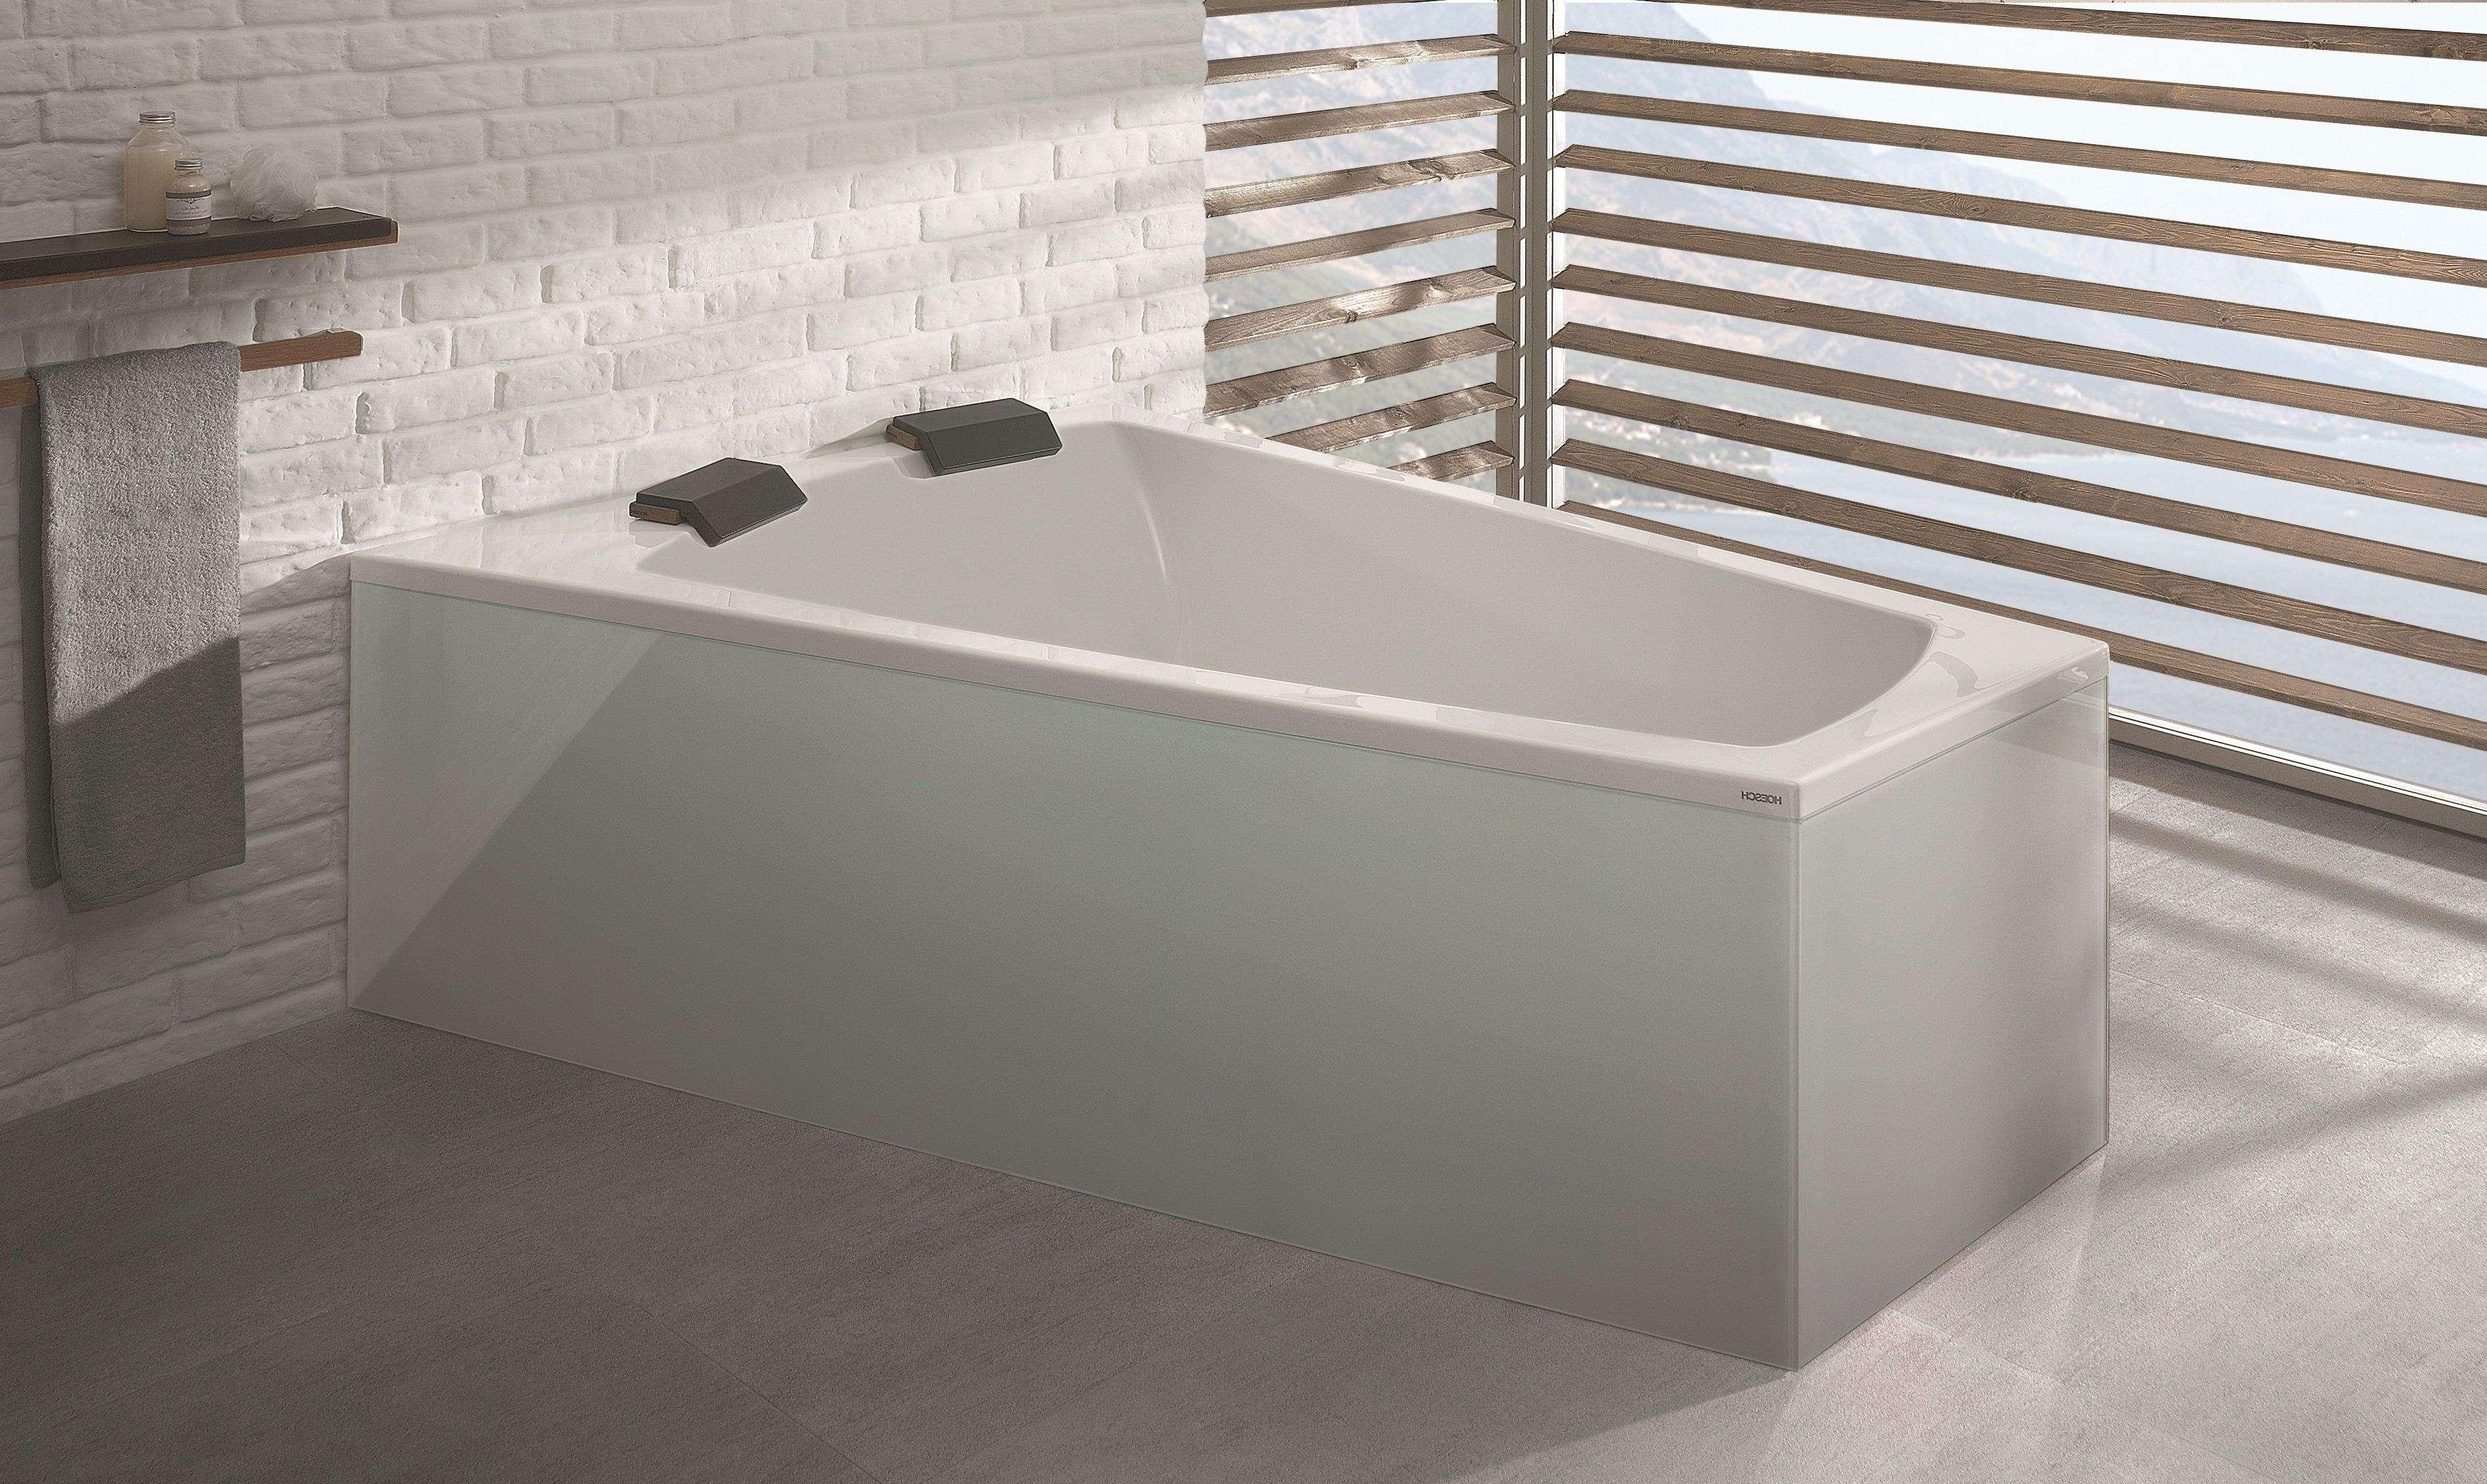 hoesch largo trapezbadewanne 1800 x 1400 mm links wei. Black Bedroom Furniture Sets. Home Design Ideas